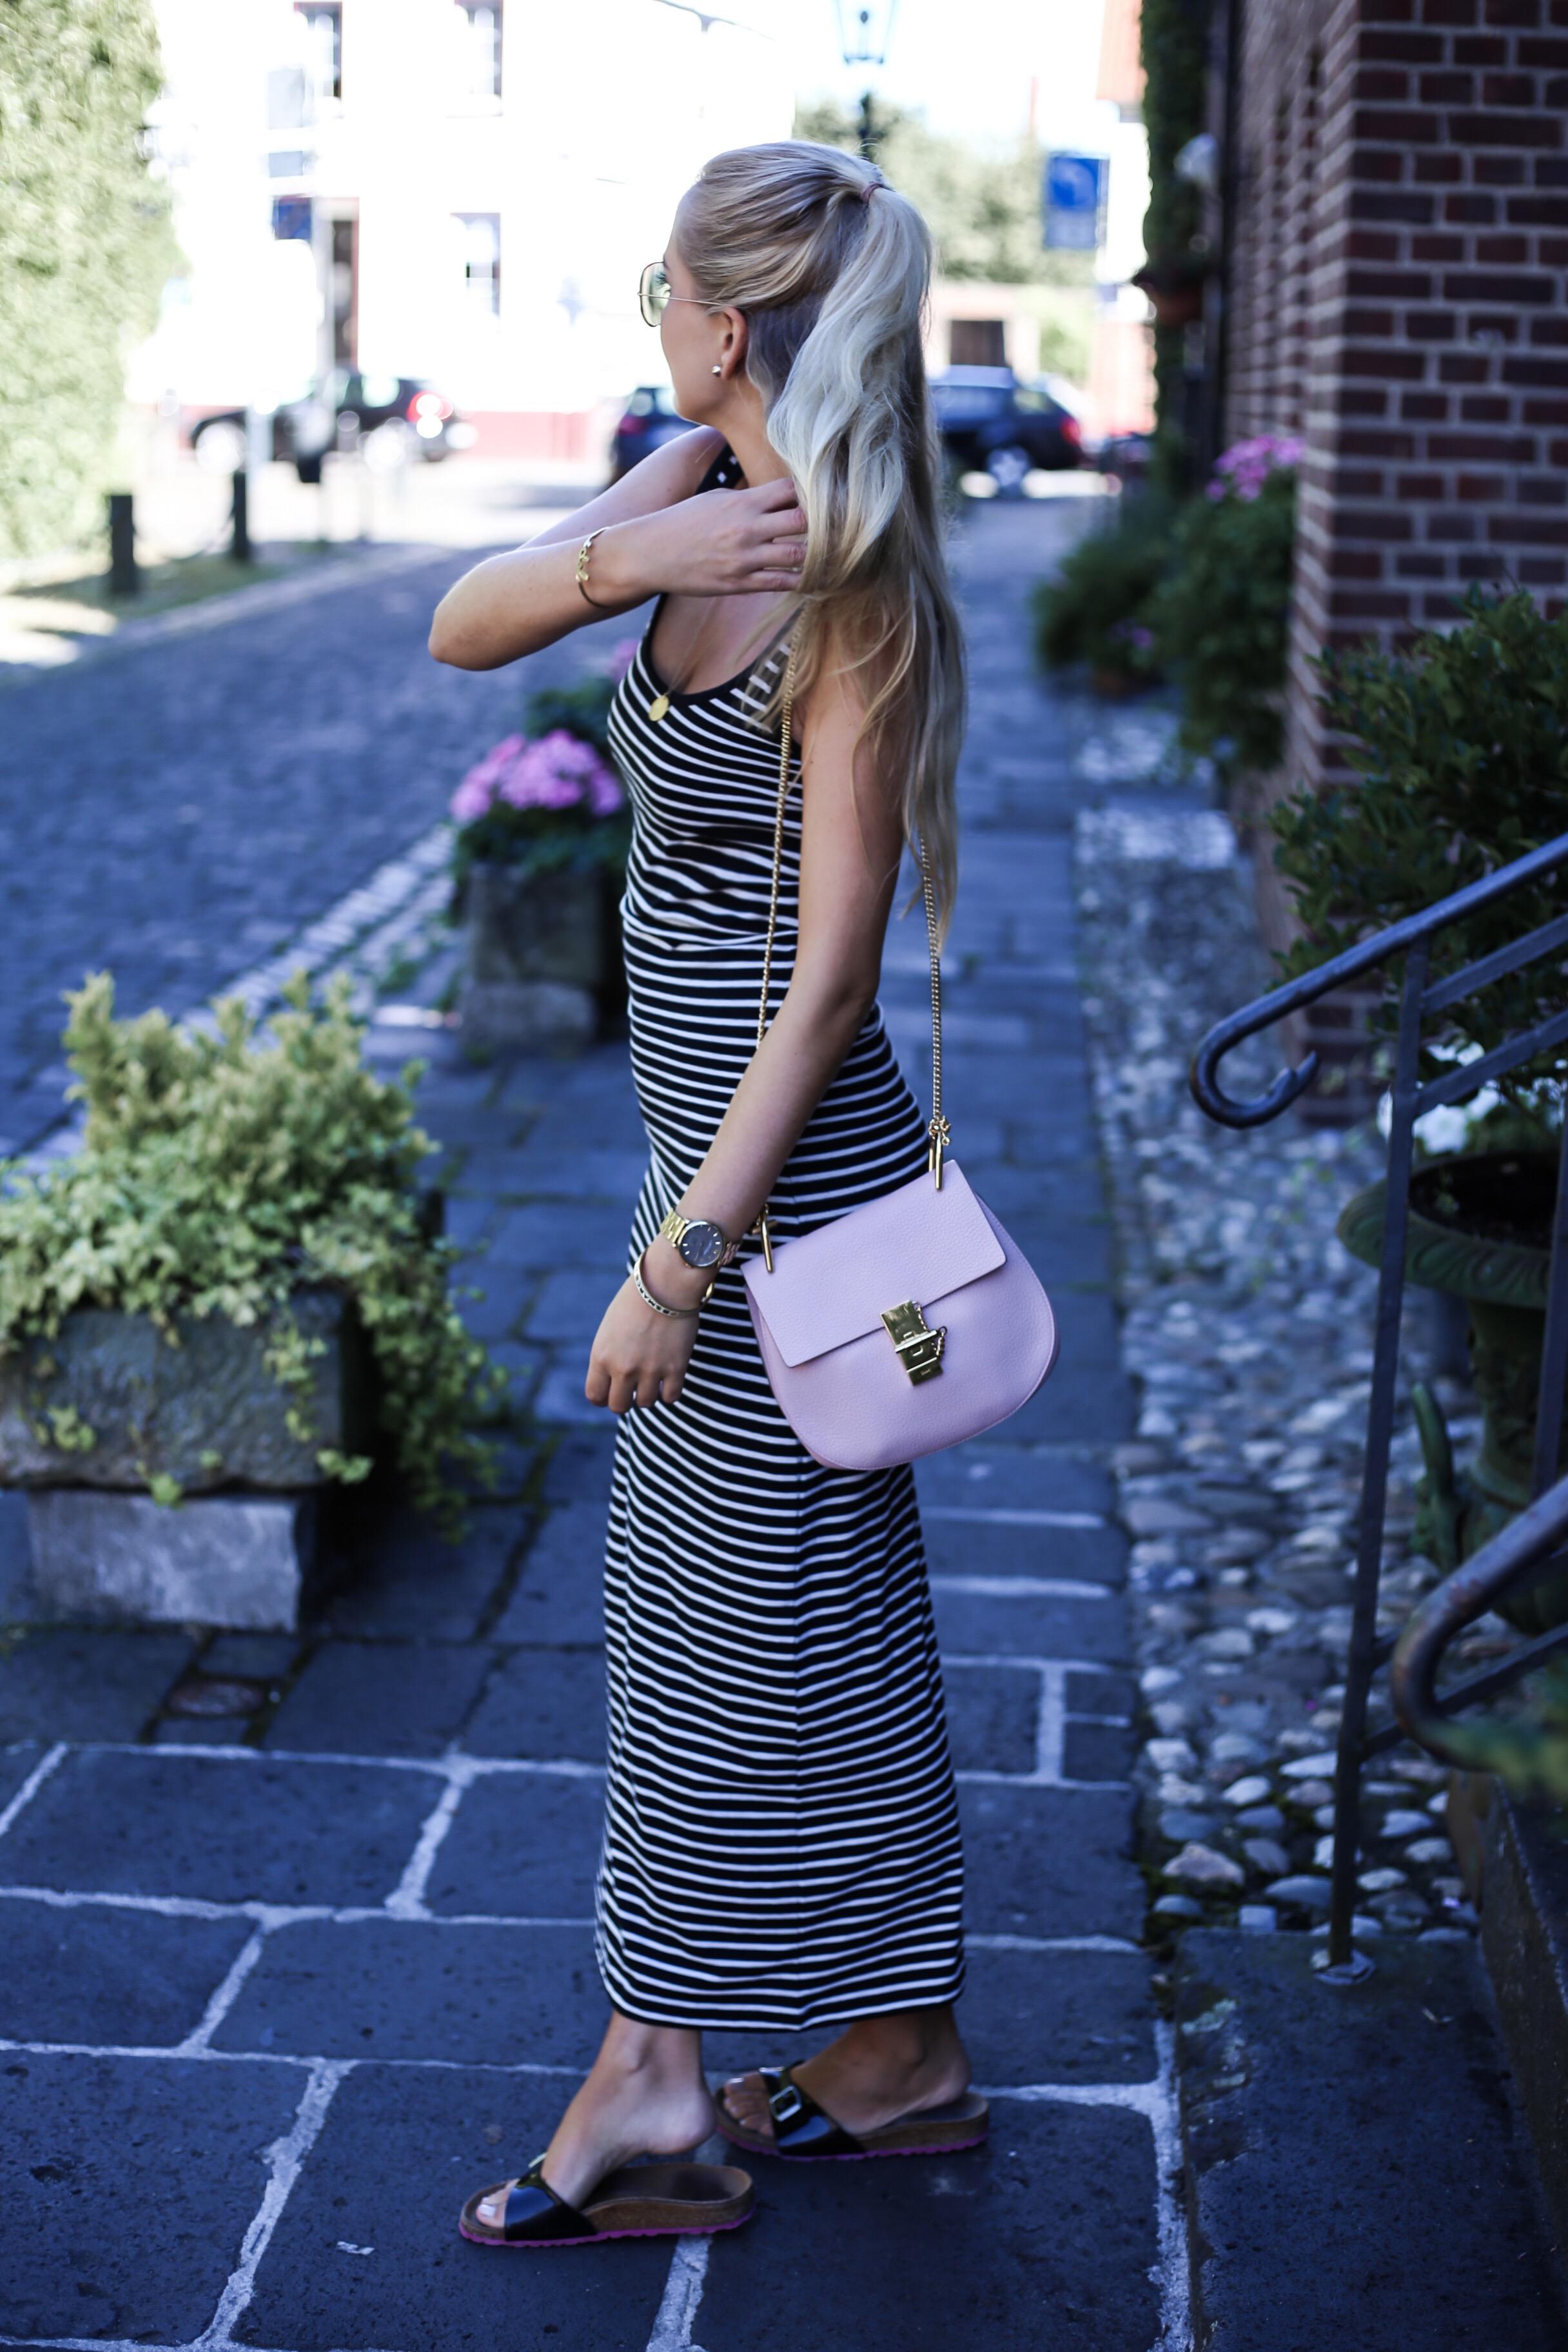 dresses with stripes sisichen. Black Bedroom Furniture Sets. Home Design Ideas